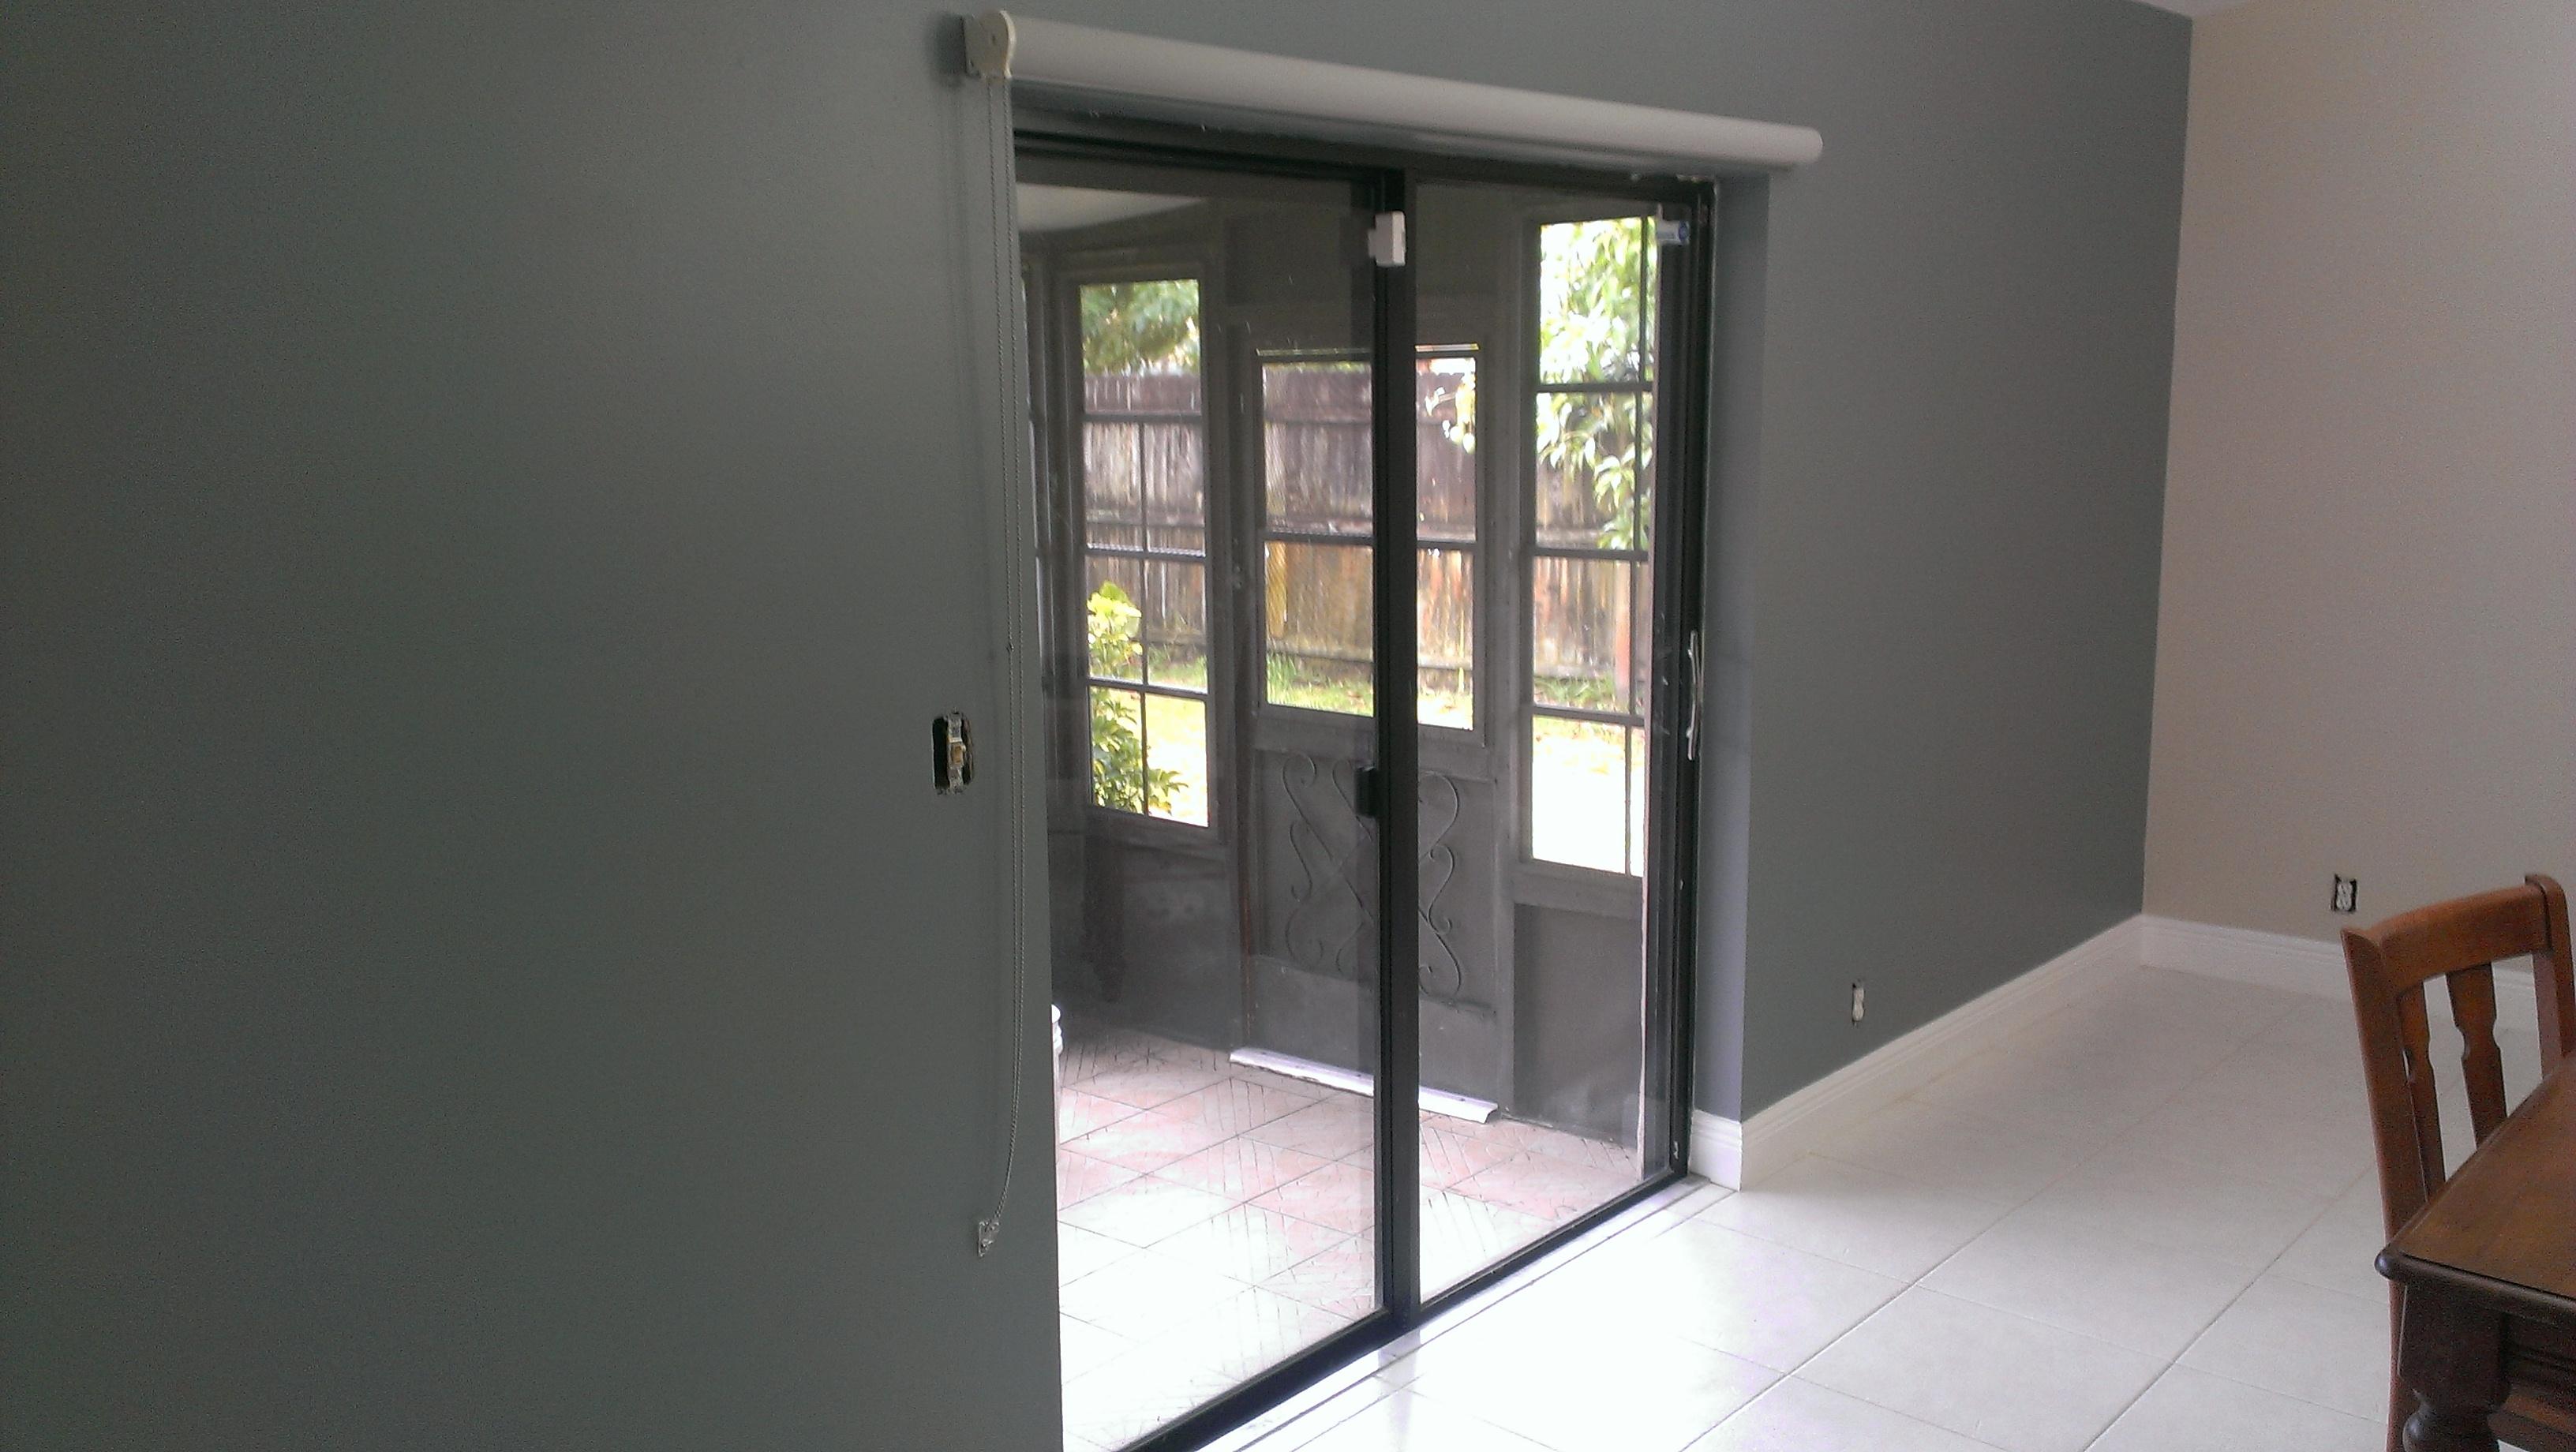 Blackout Shades For Sliding Glass Doorssliding glass door roller shades manufacturers of custom window